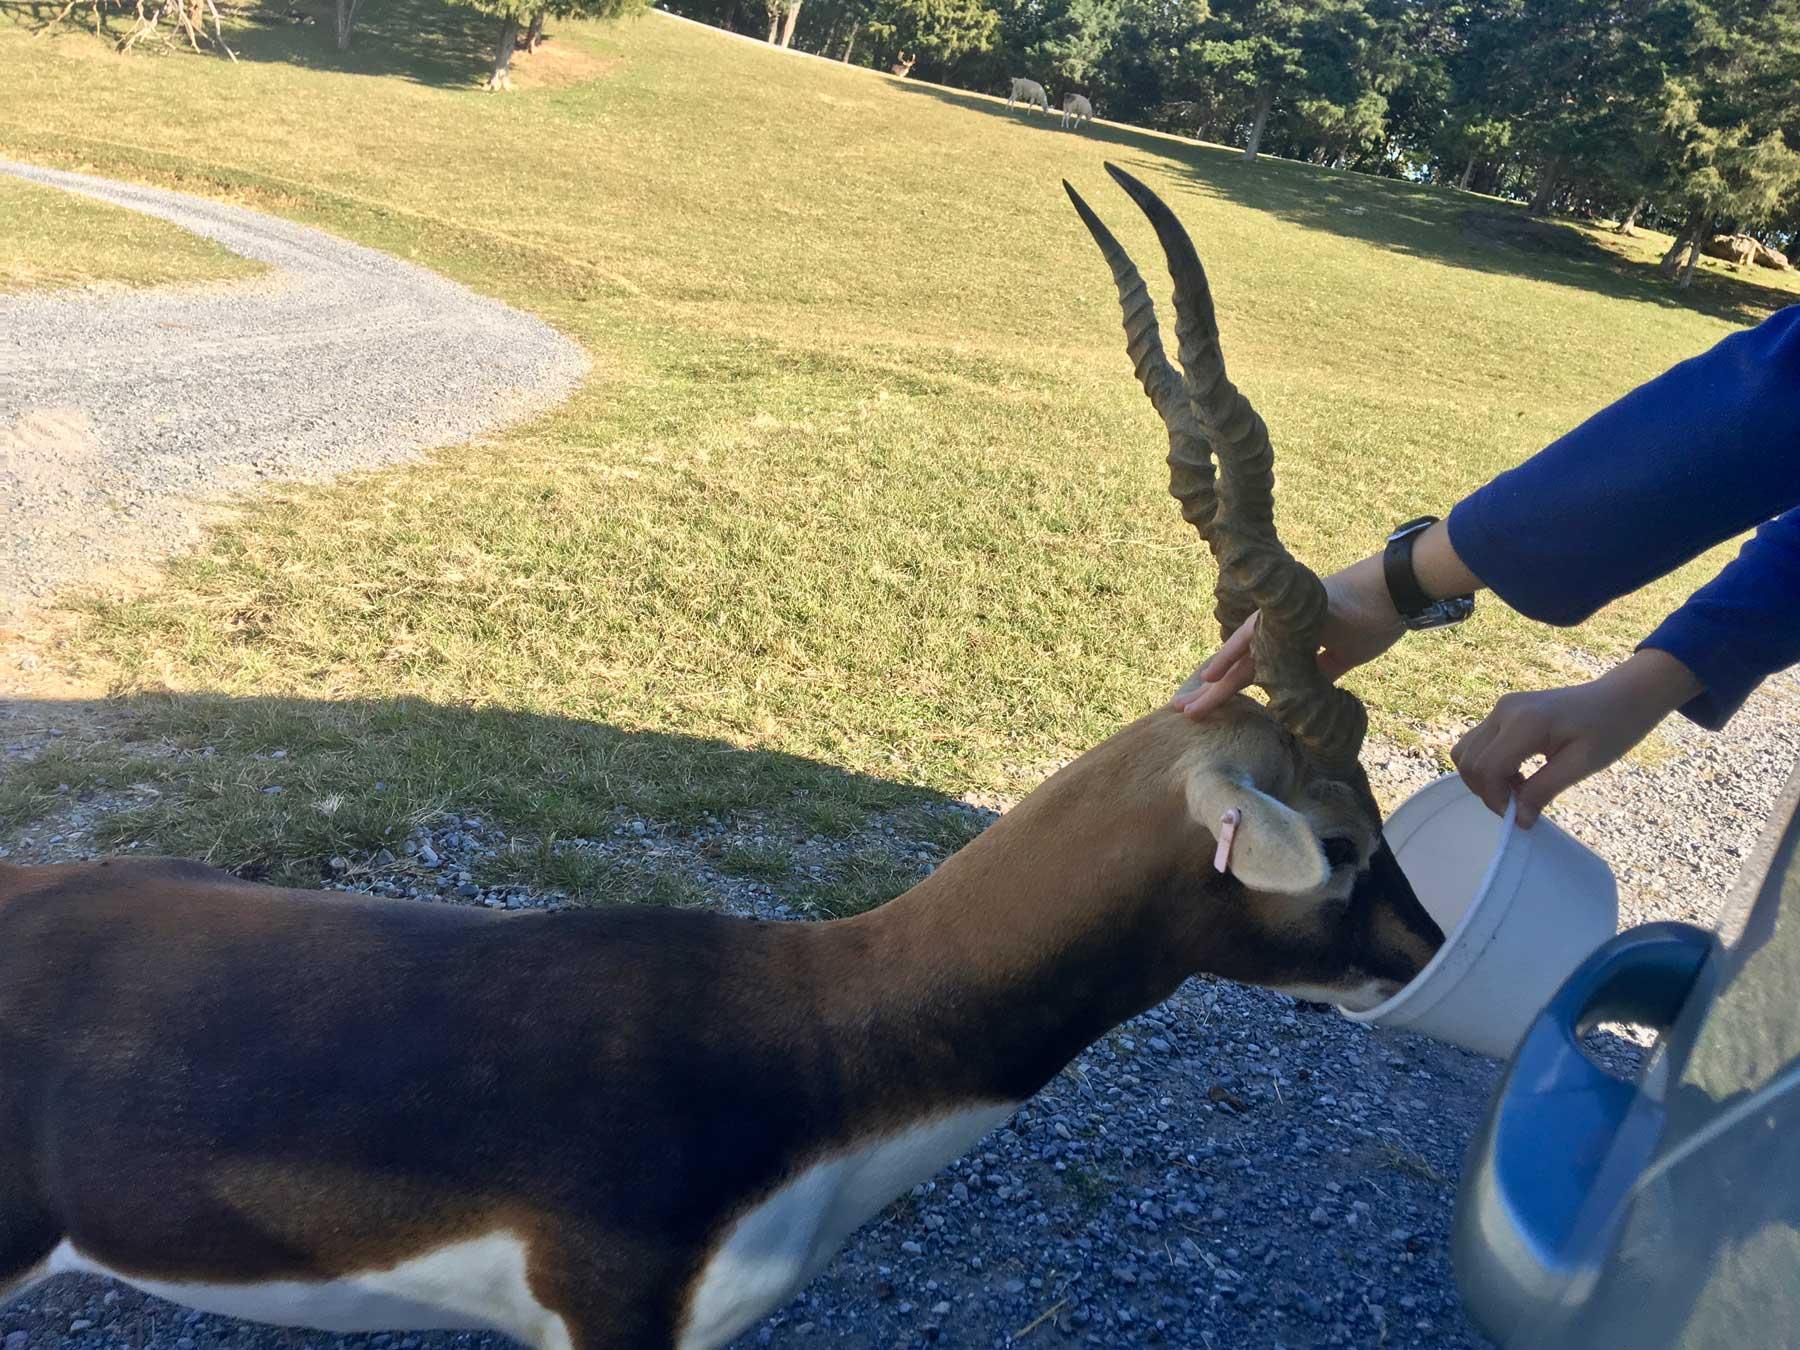 Feeding and petting a spiral-horned blackbuck antelope at Virginia Safari Park, Natural Bridge, VA